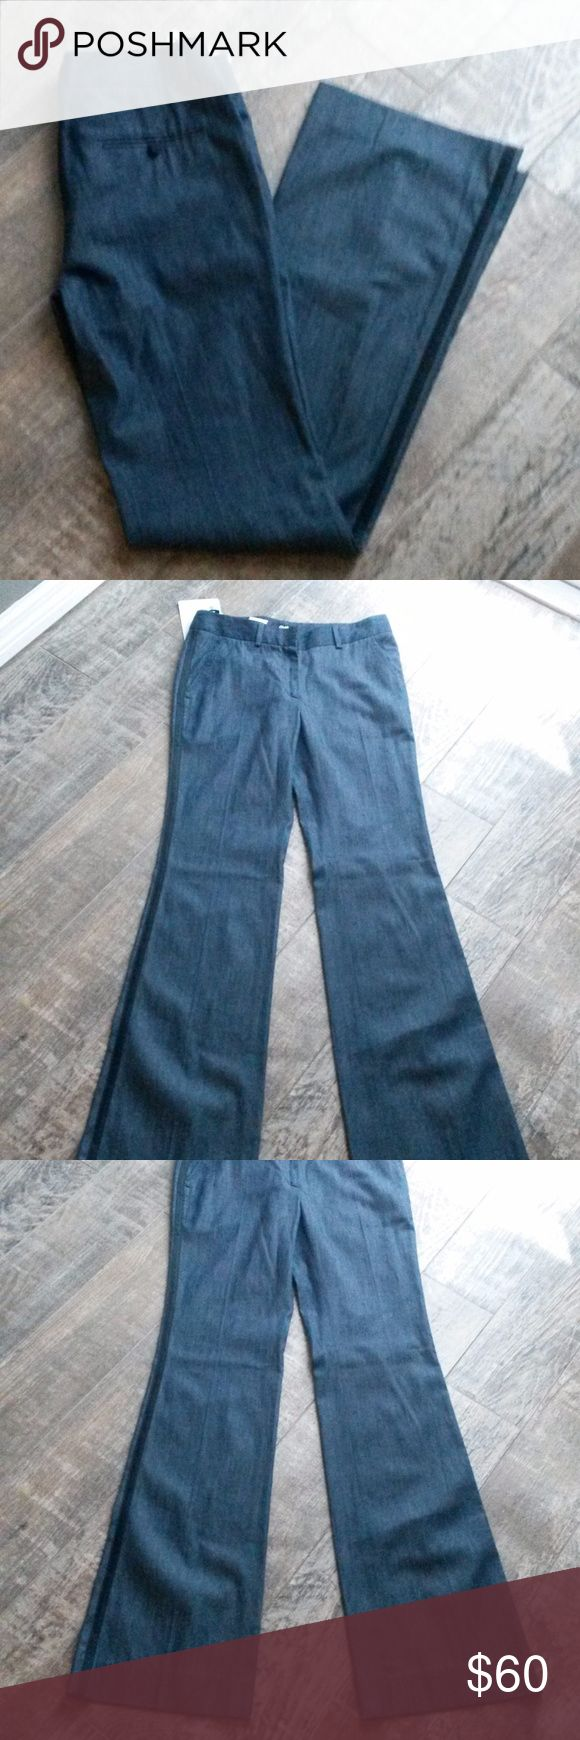 "Battistoni Italian Navy Blue Tuxedo Stripe Pants Italian made navy blue pants with a black satin tuxedo stripe on the outside and a wide leg. 4 pockets with a clasp and zipper closure. Italian size 42 = size 6. 100% cotton  approx. measurements: Inseam: 34"" Rise: 9"" Back: 12"" Flat waist:15"" Leg opening: 10"" Battistoni Pants Wide Leg"